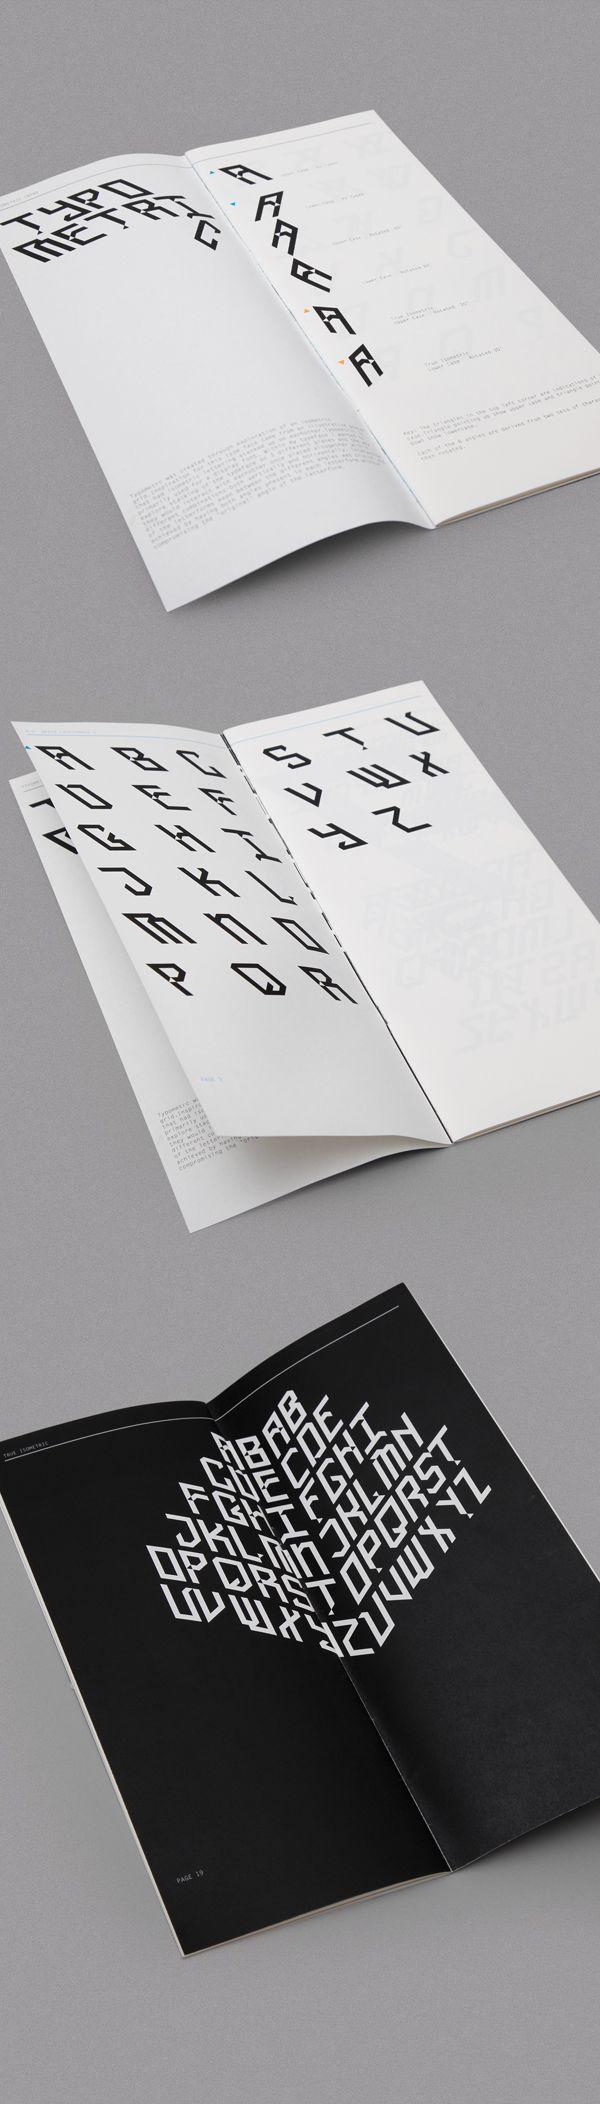 Typometric, isometric typeface design on Behance